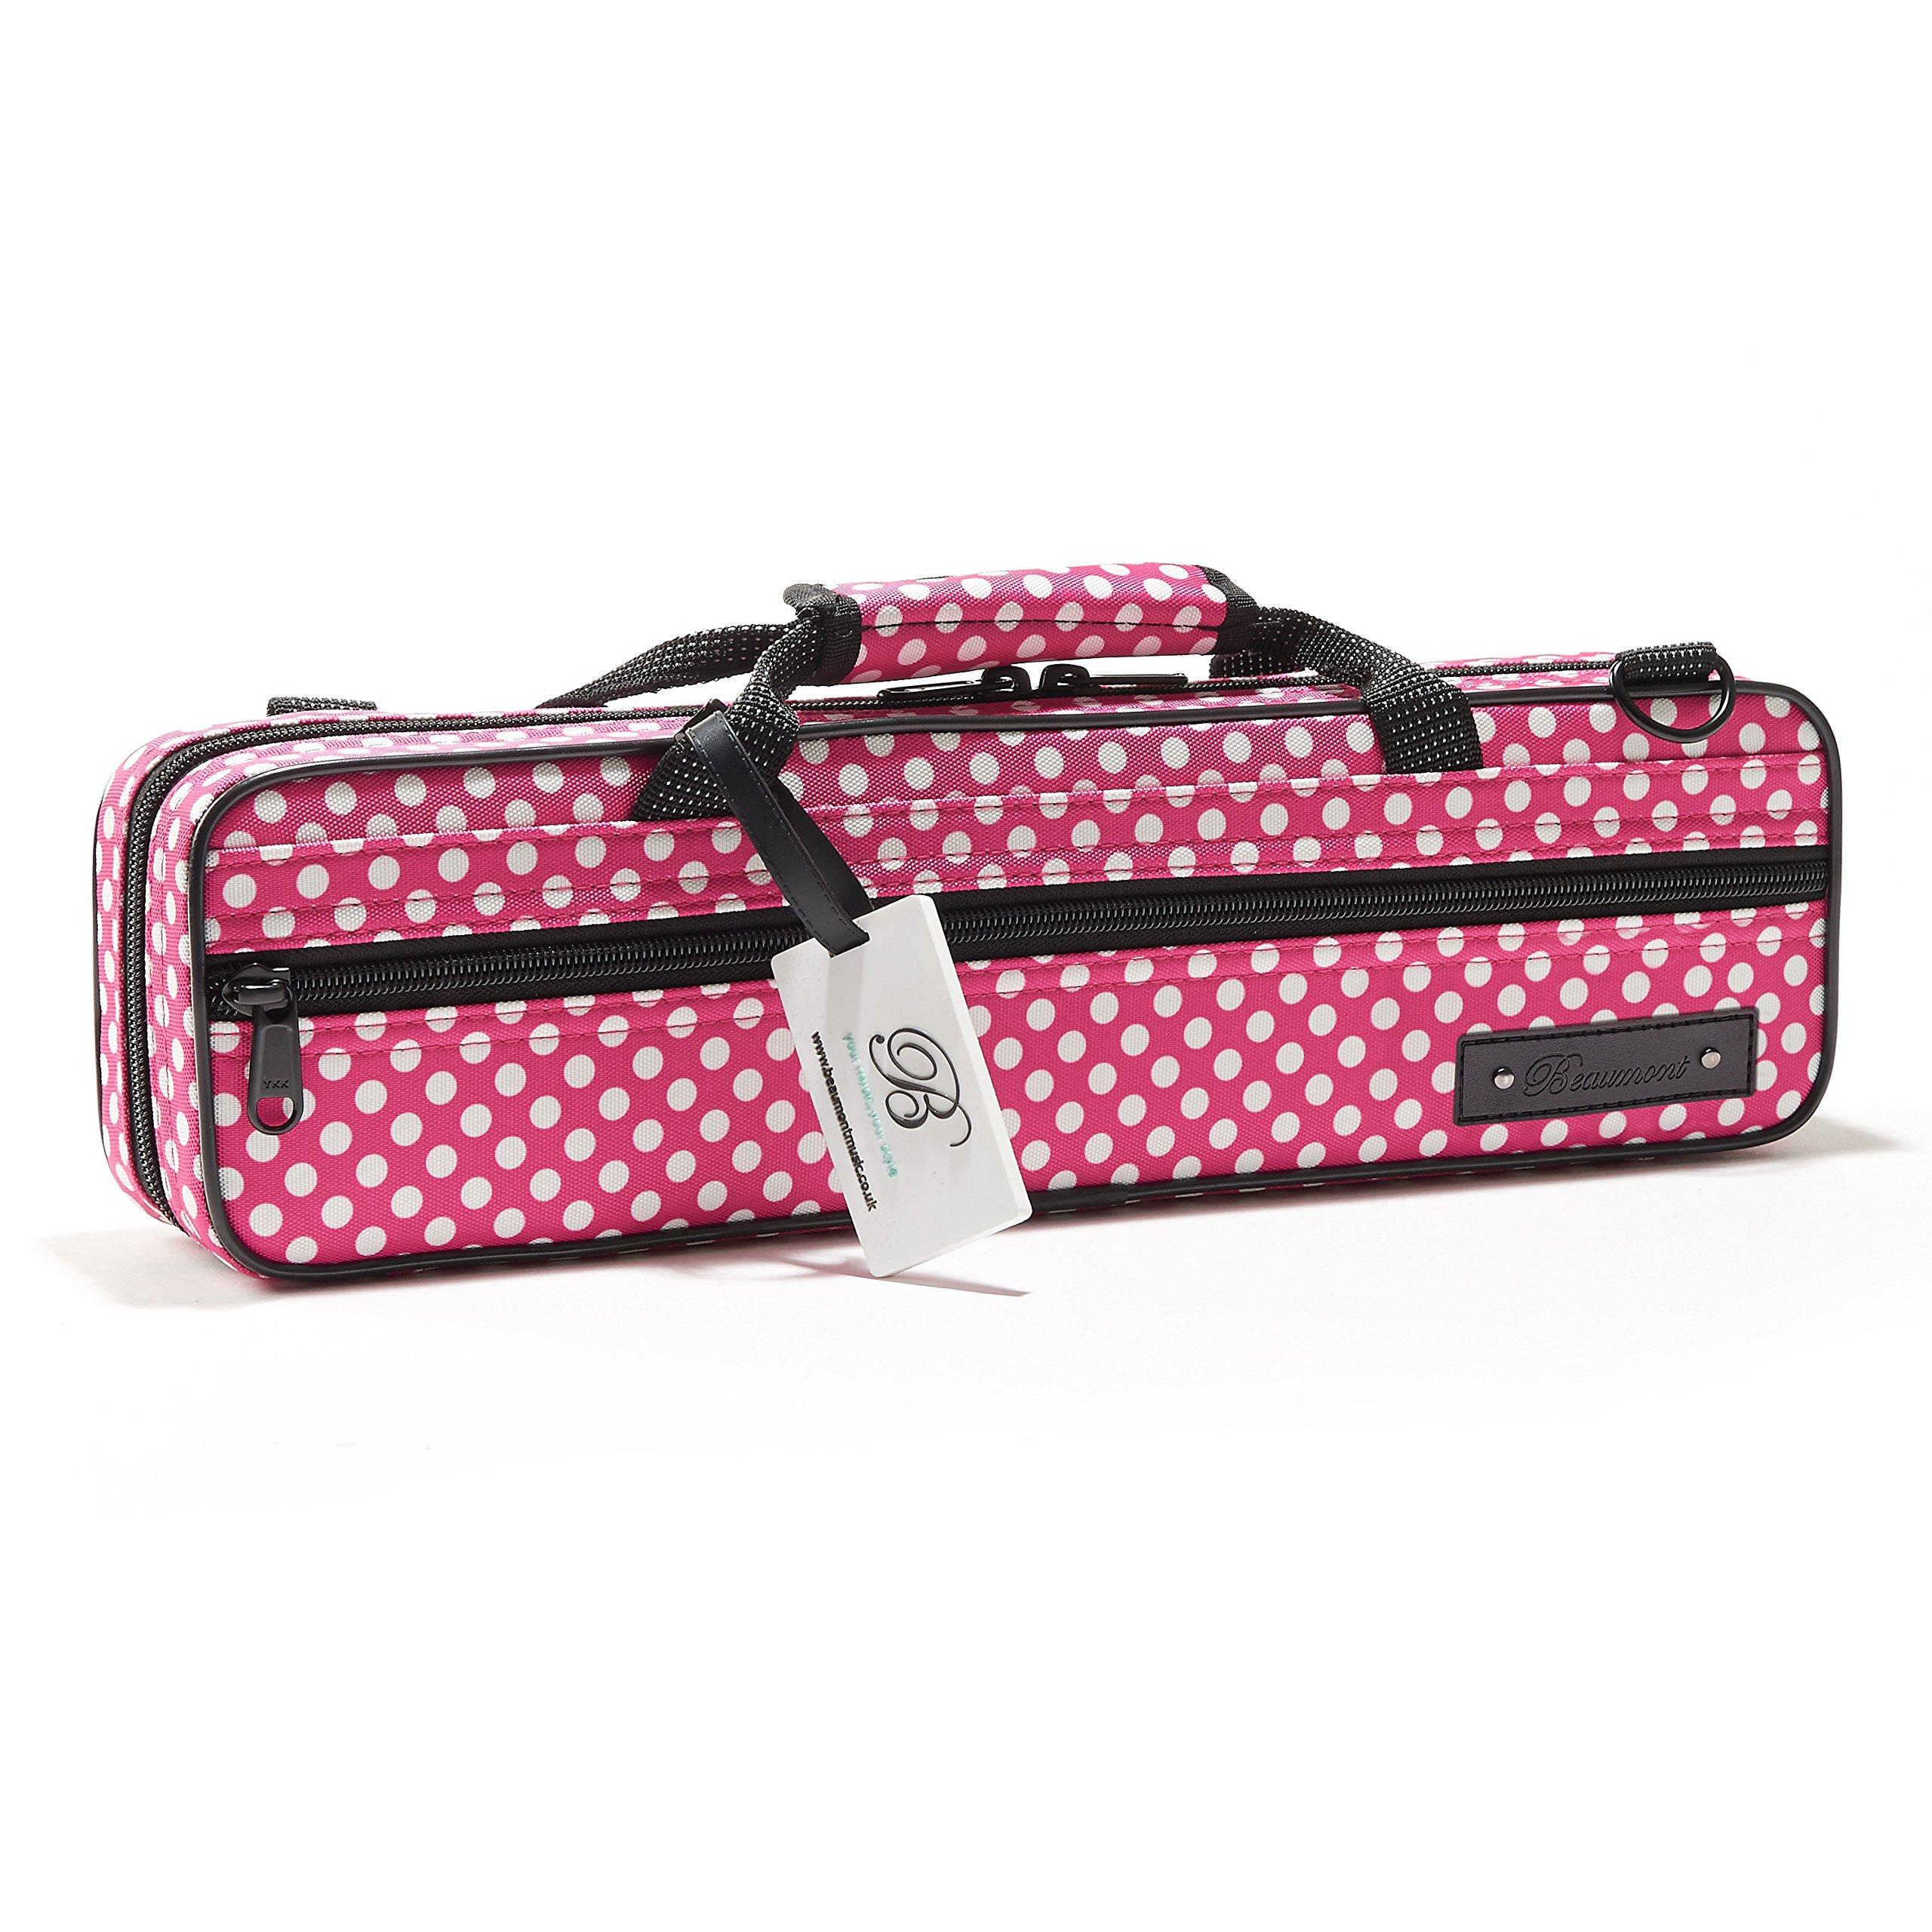 Flute Case - Beaumont C-Foot Flute Cover - Lightweight Canvas - Pink Polka Dot Design